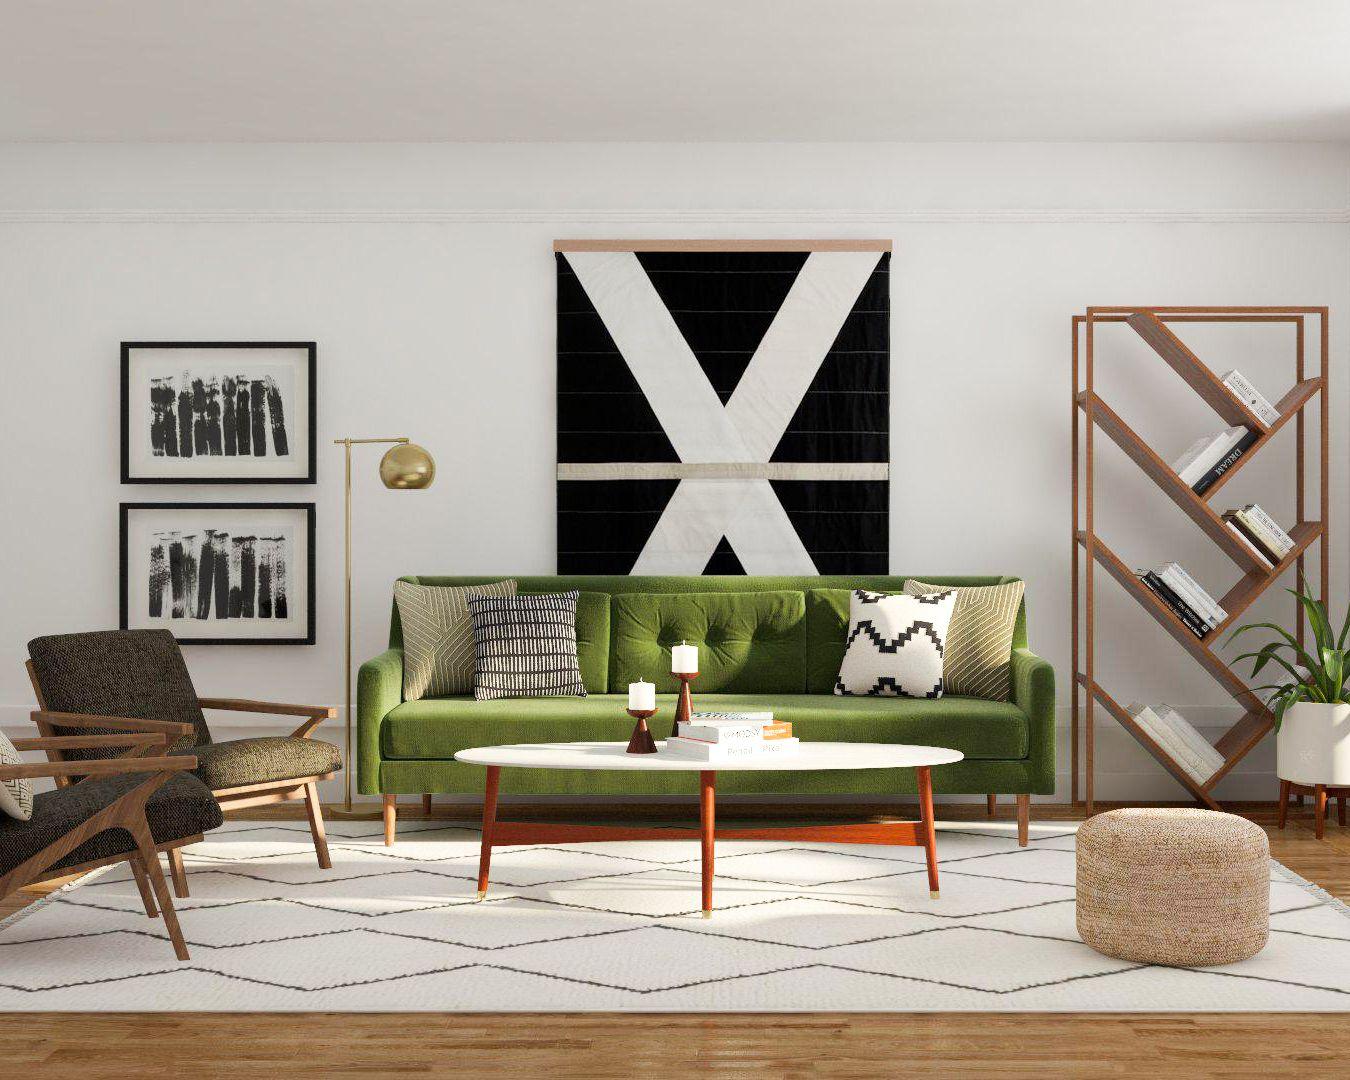 Mid Century Modern Living Room Makeover Ideas On A Budget Style Spotlight Mod Visionary Design